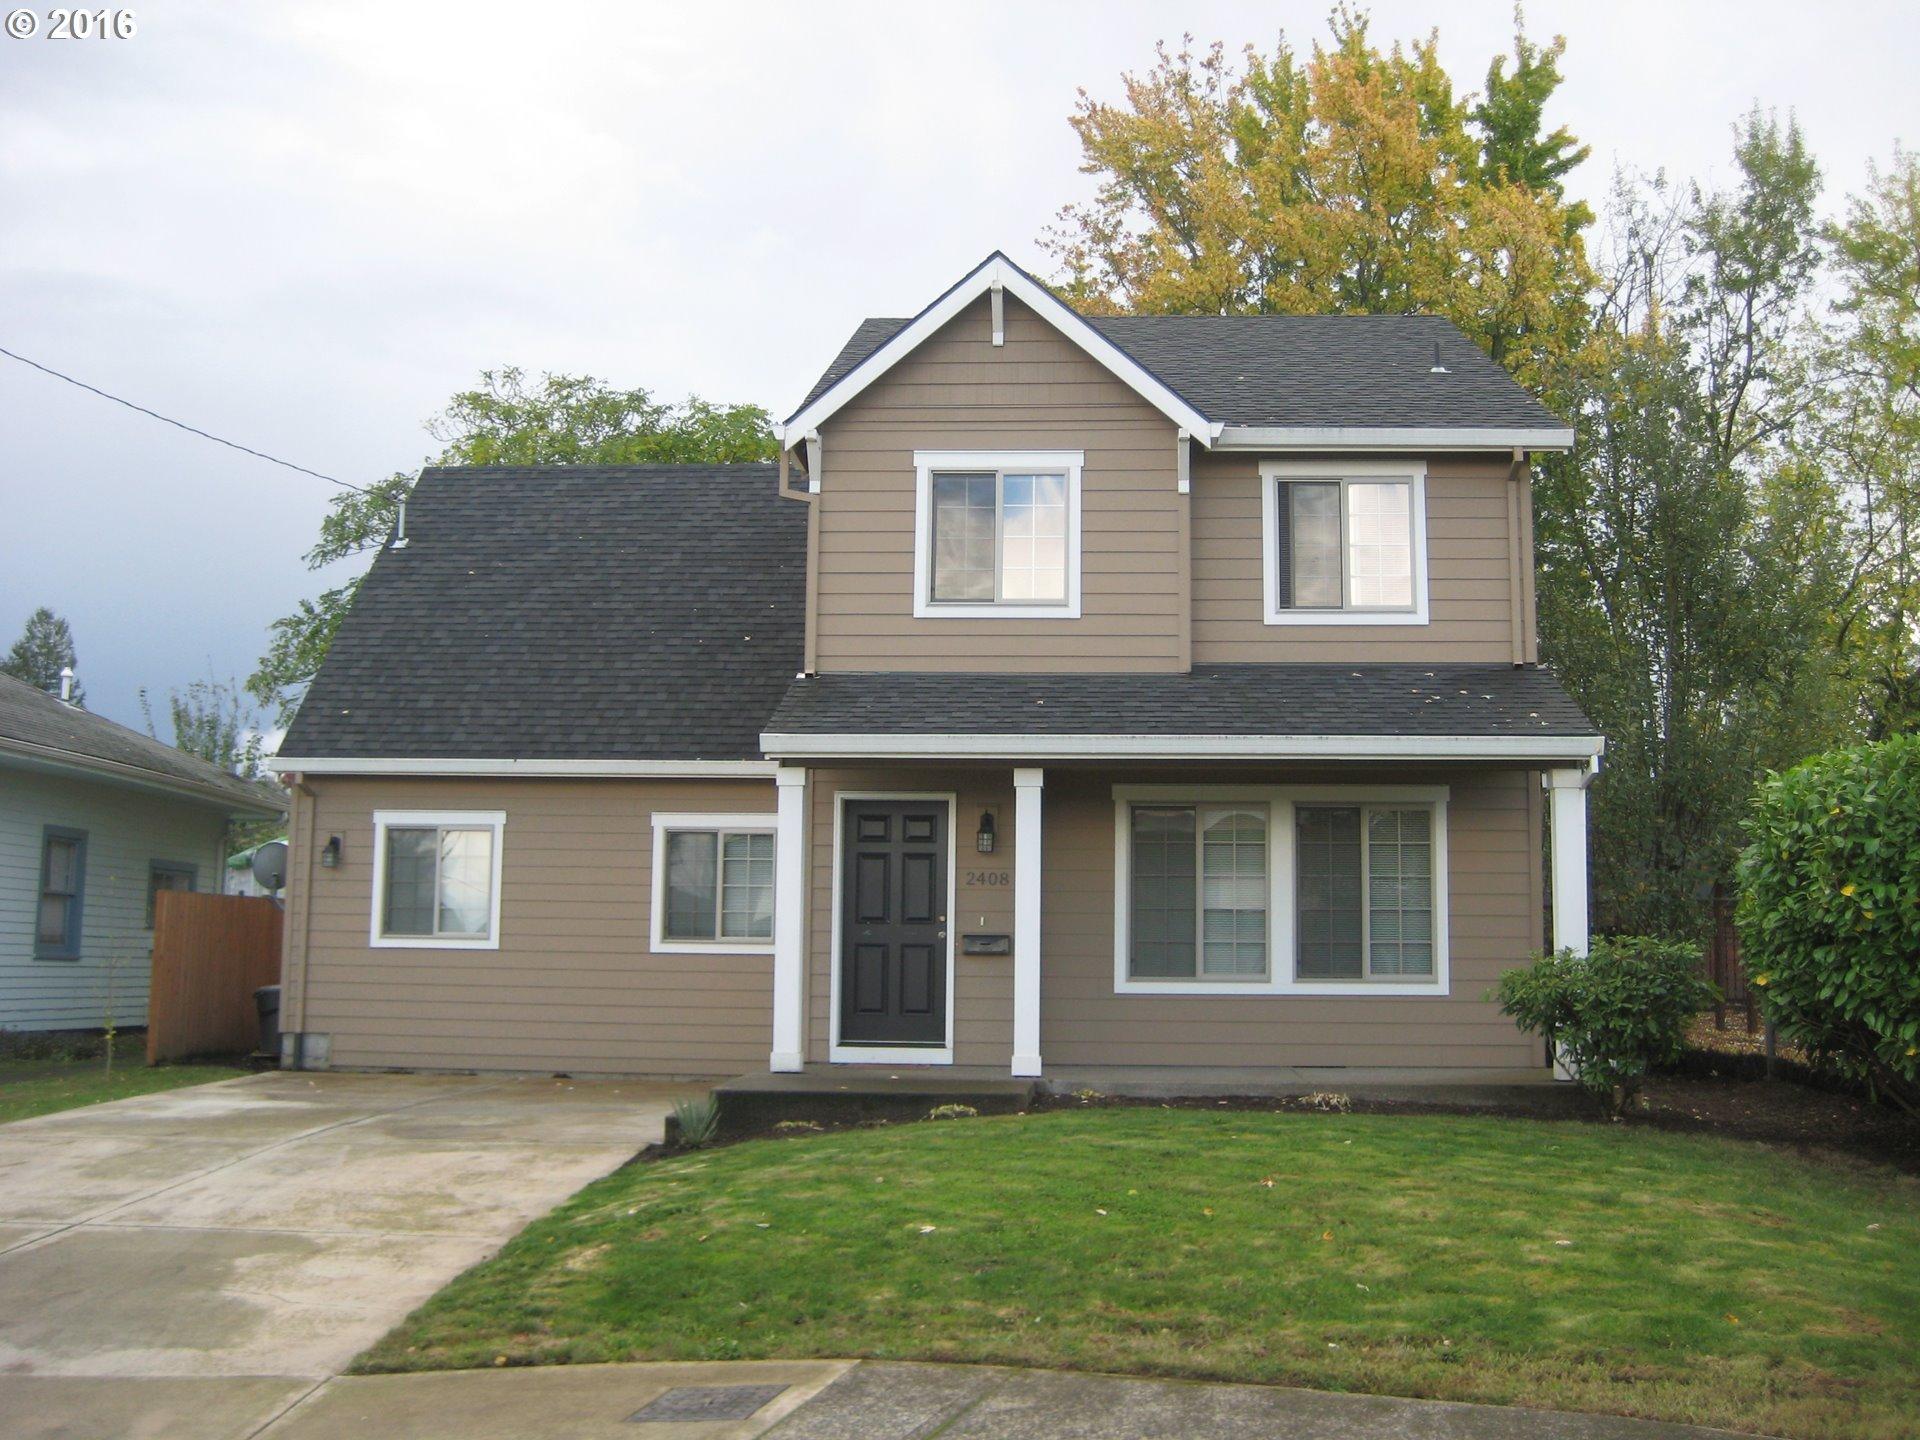 2408 N BALDWIN ST, Portland, OR 97217